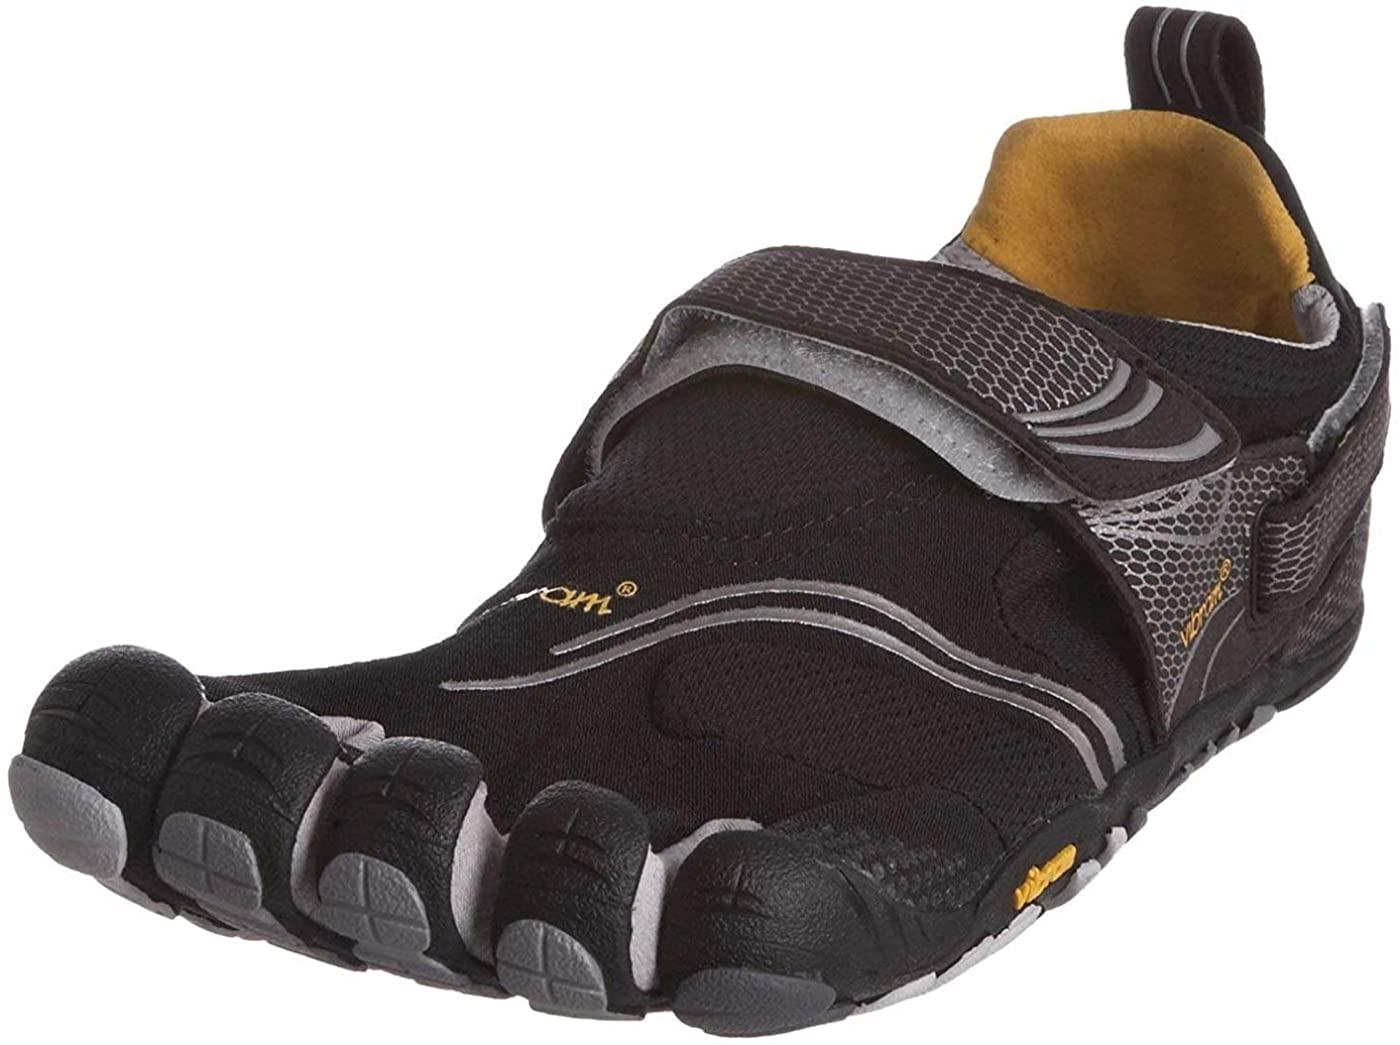 Vibram Five Fingers Men's KMD Sport Athletic Training Shoe